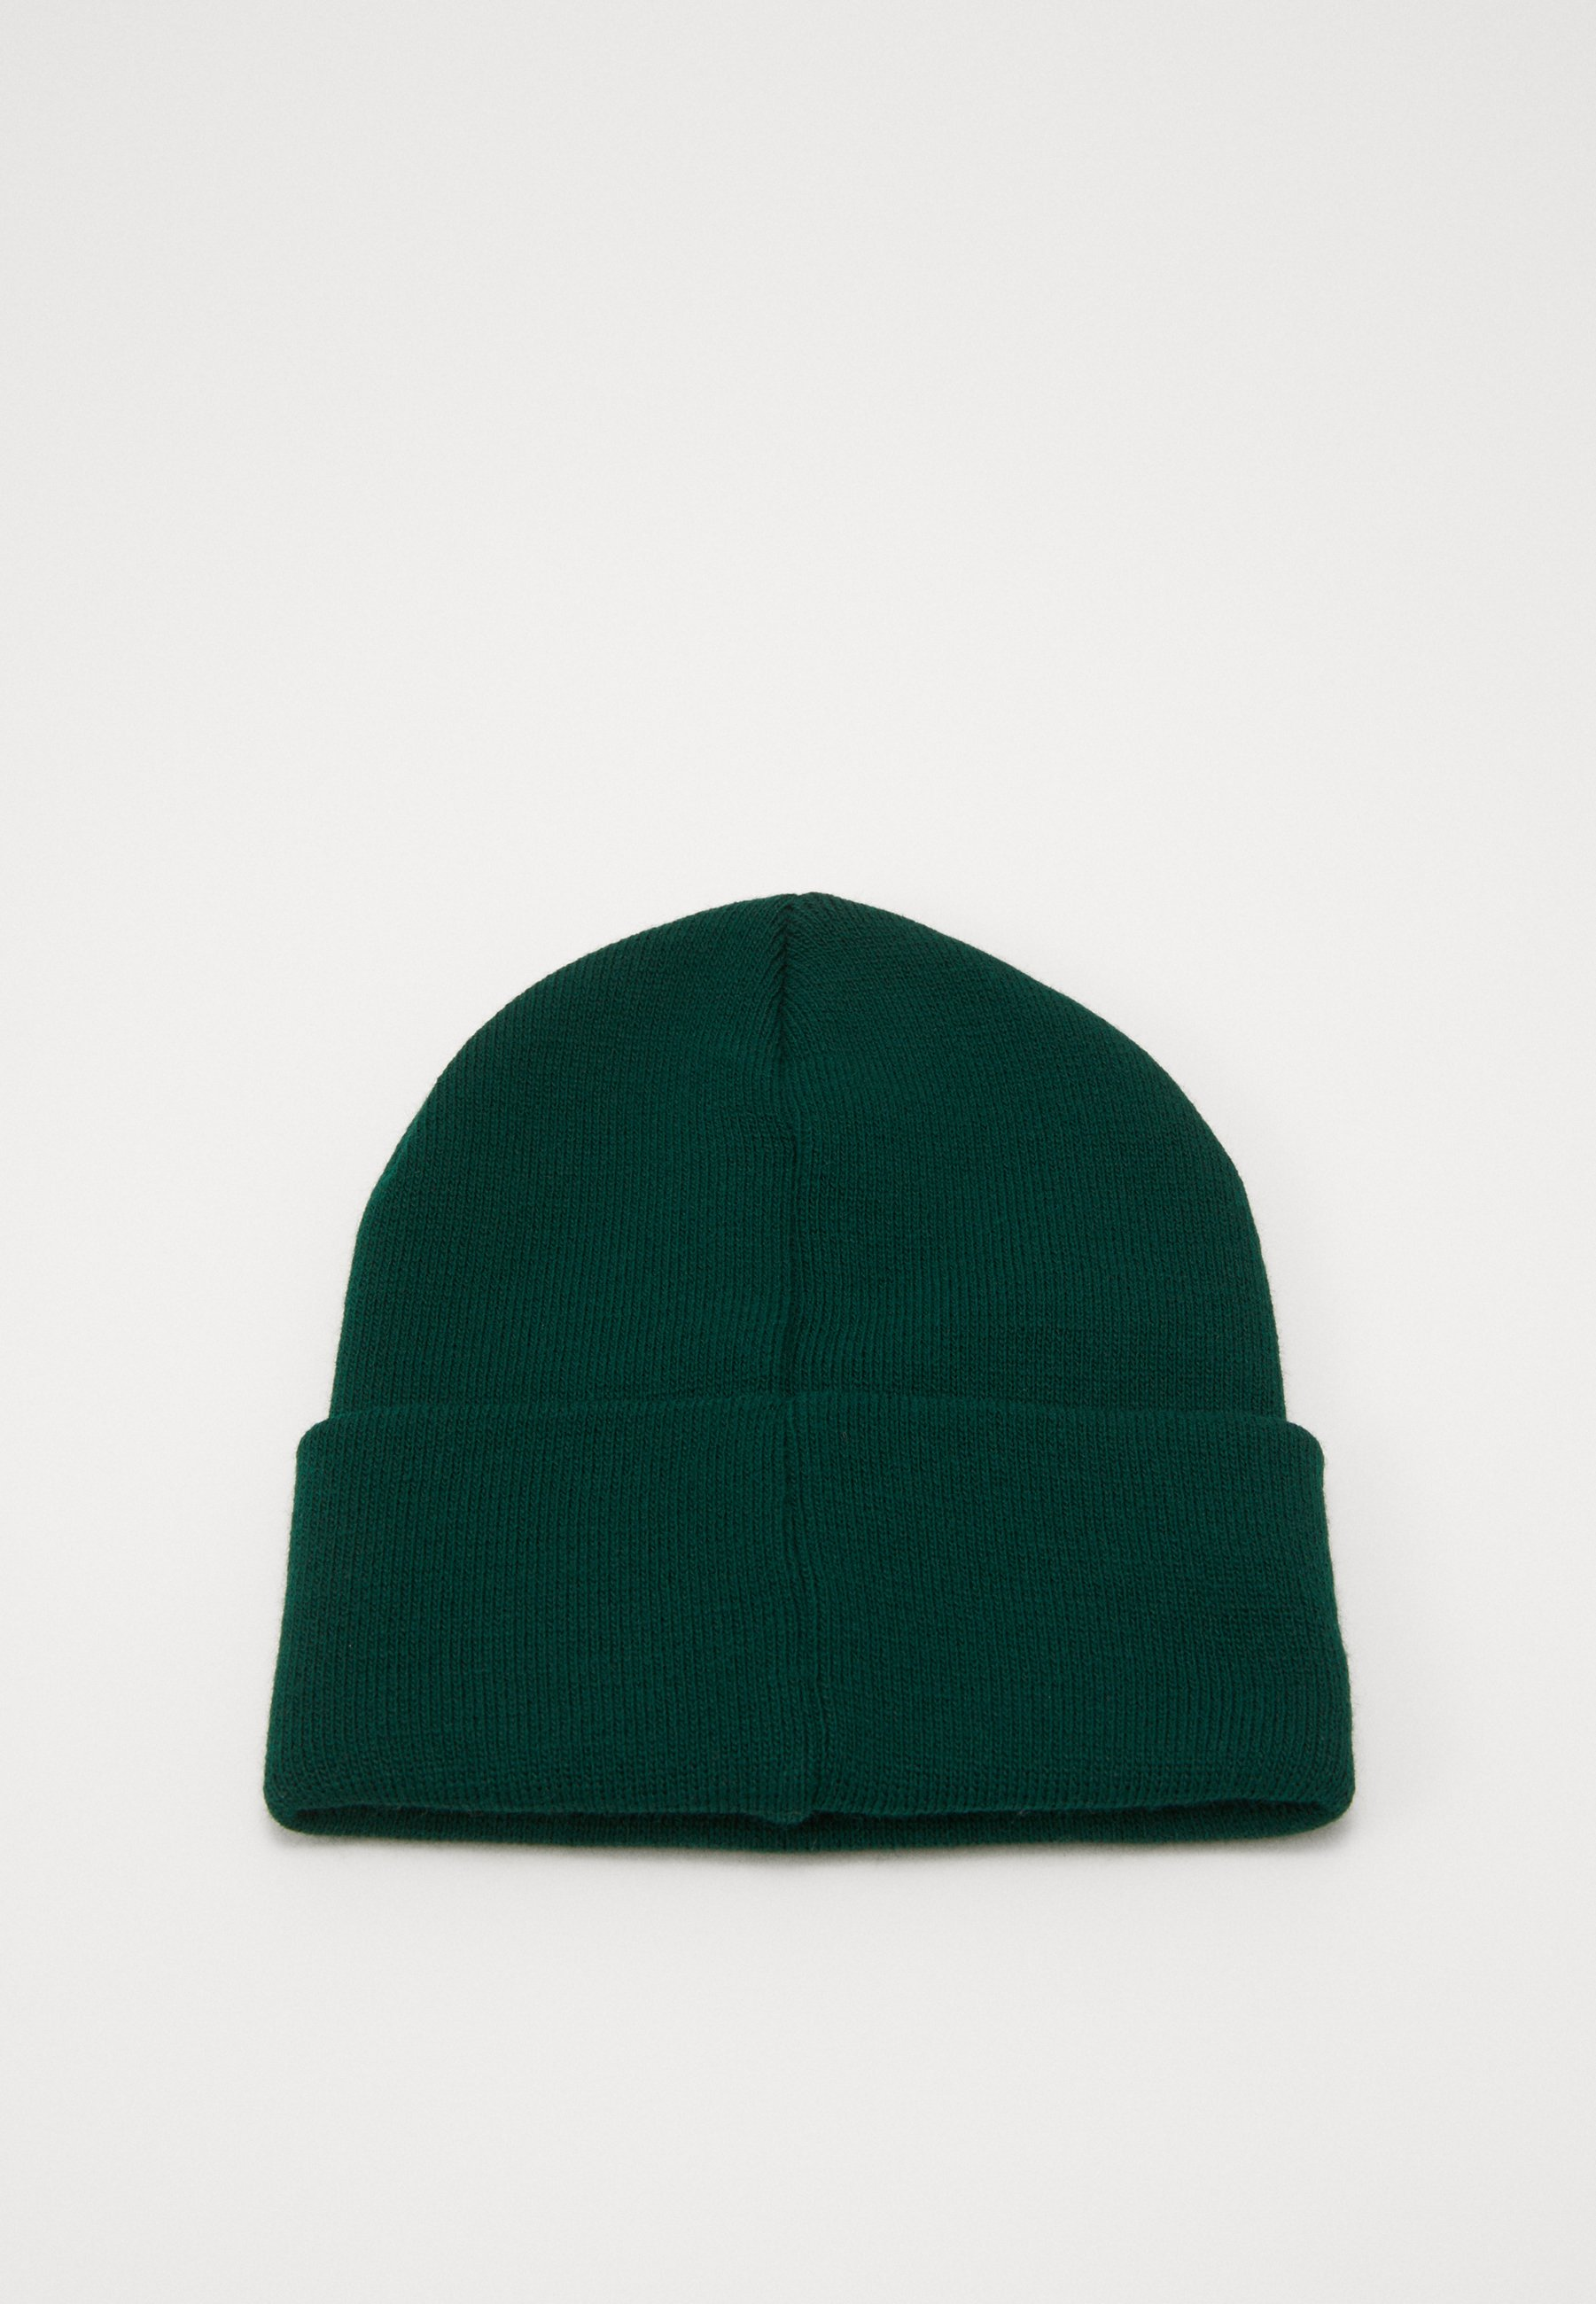 Replay Lue - dark green/mørkegrønn pvGUb7hgvtcDzNp